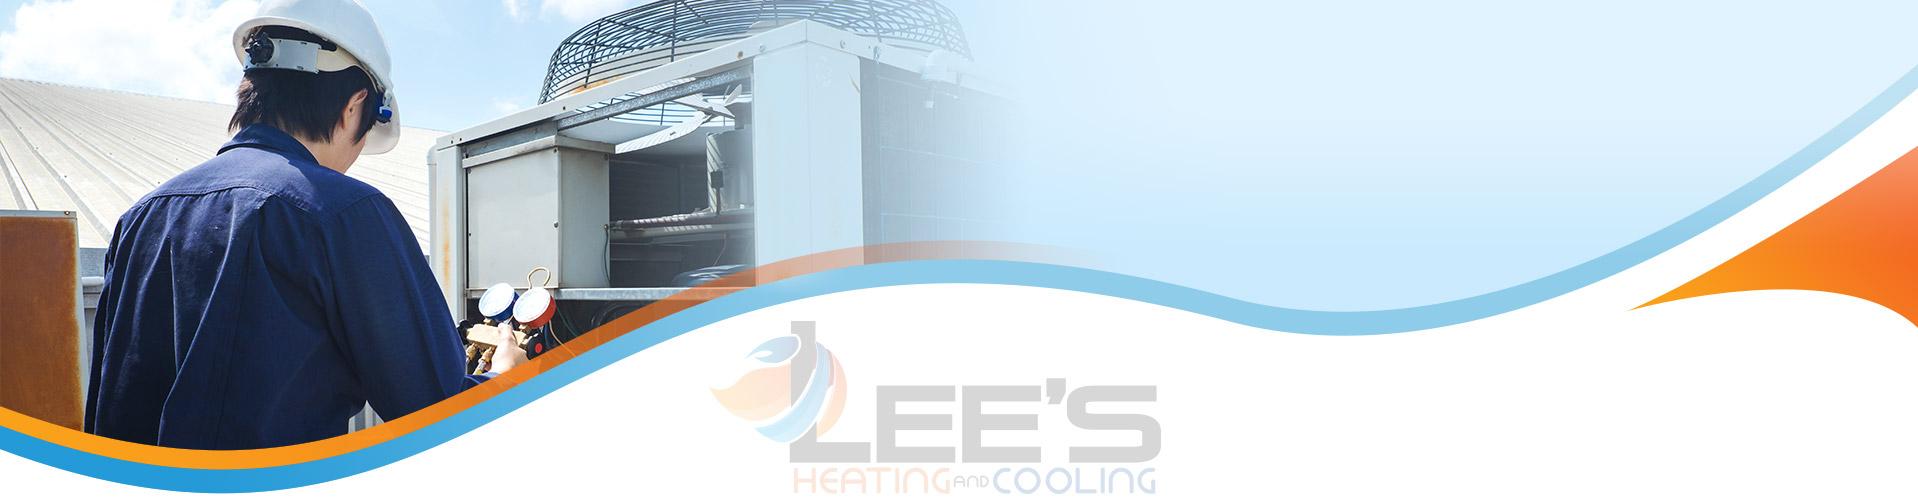 heating-cooling-101-hero